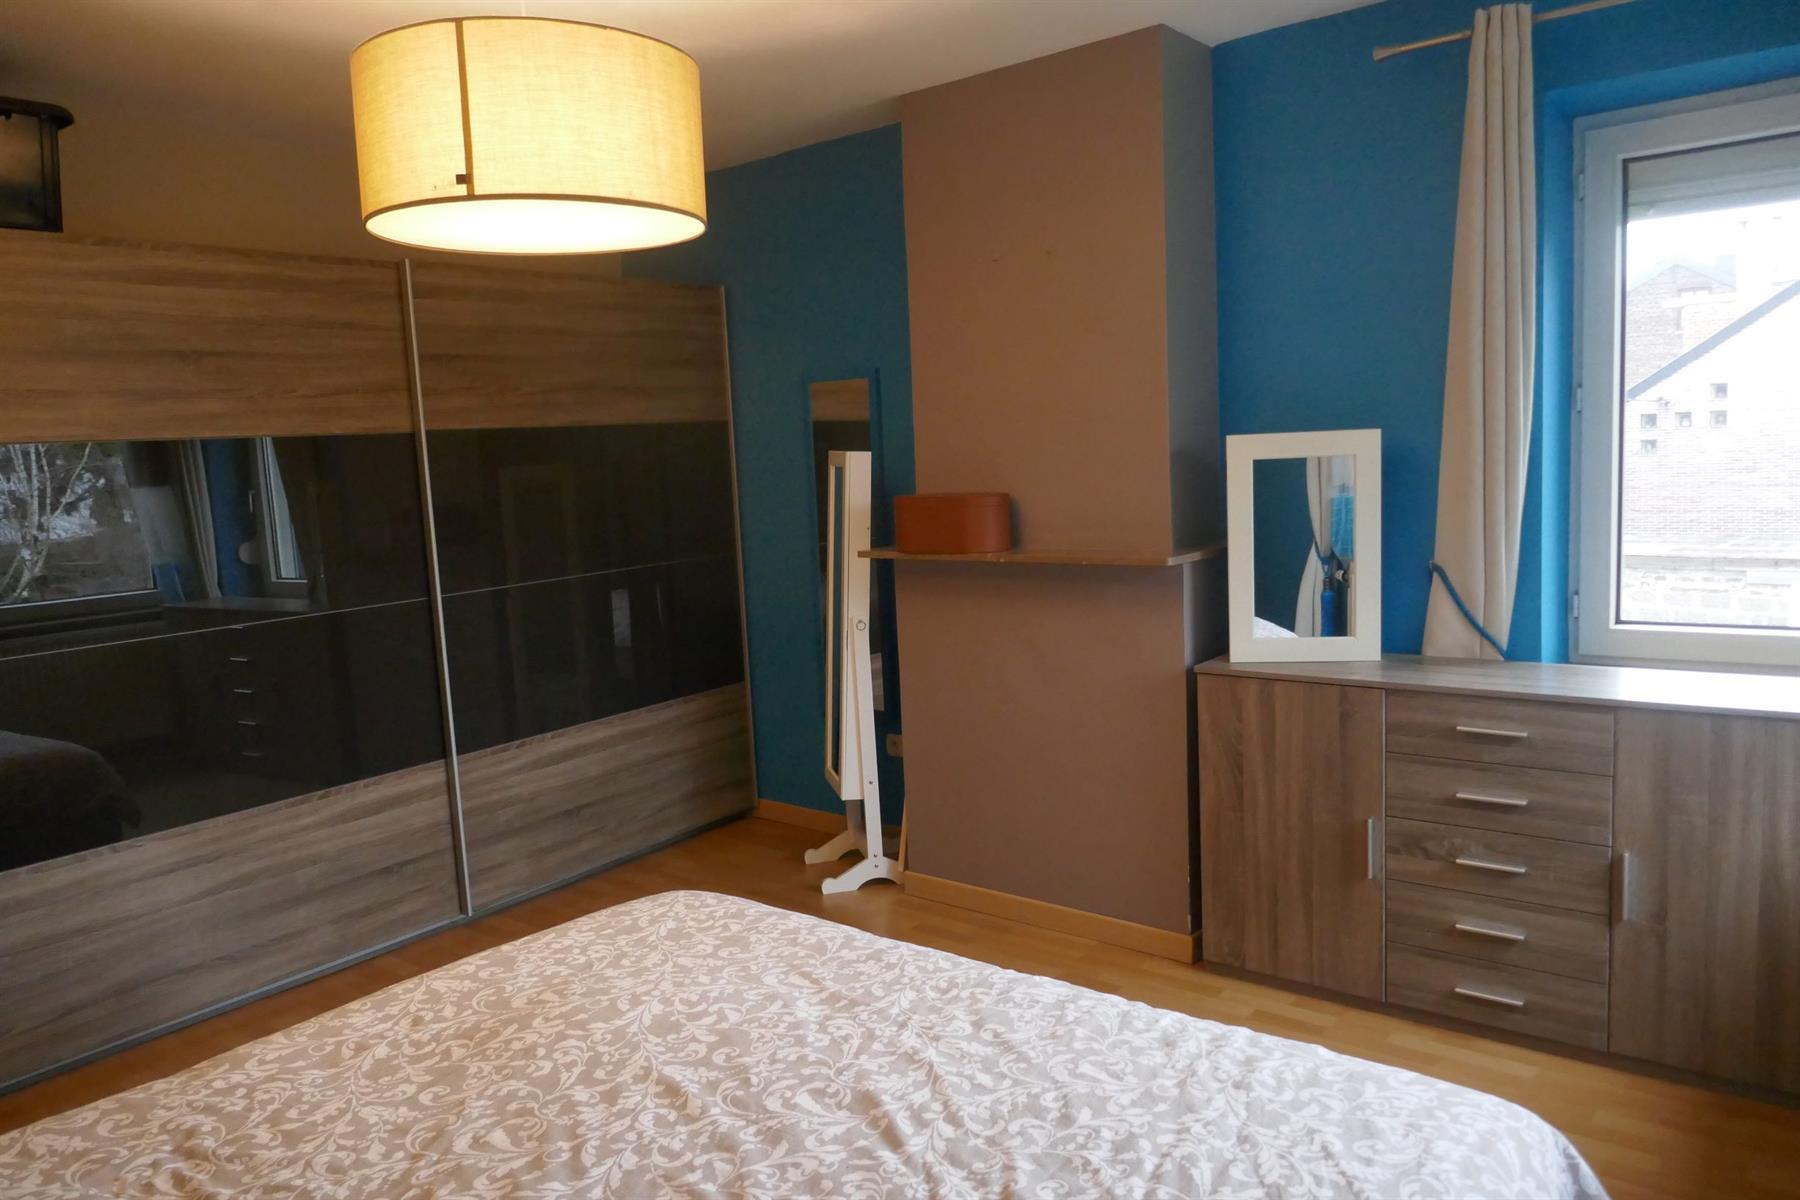 Maison - Liège Wandre - #4238639-37